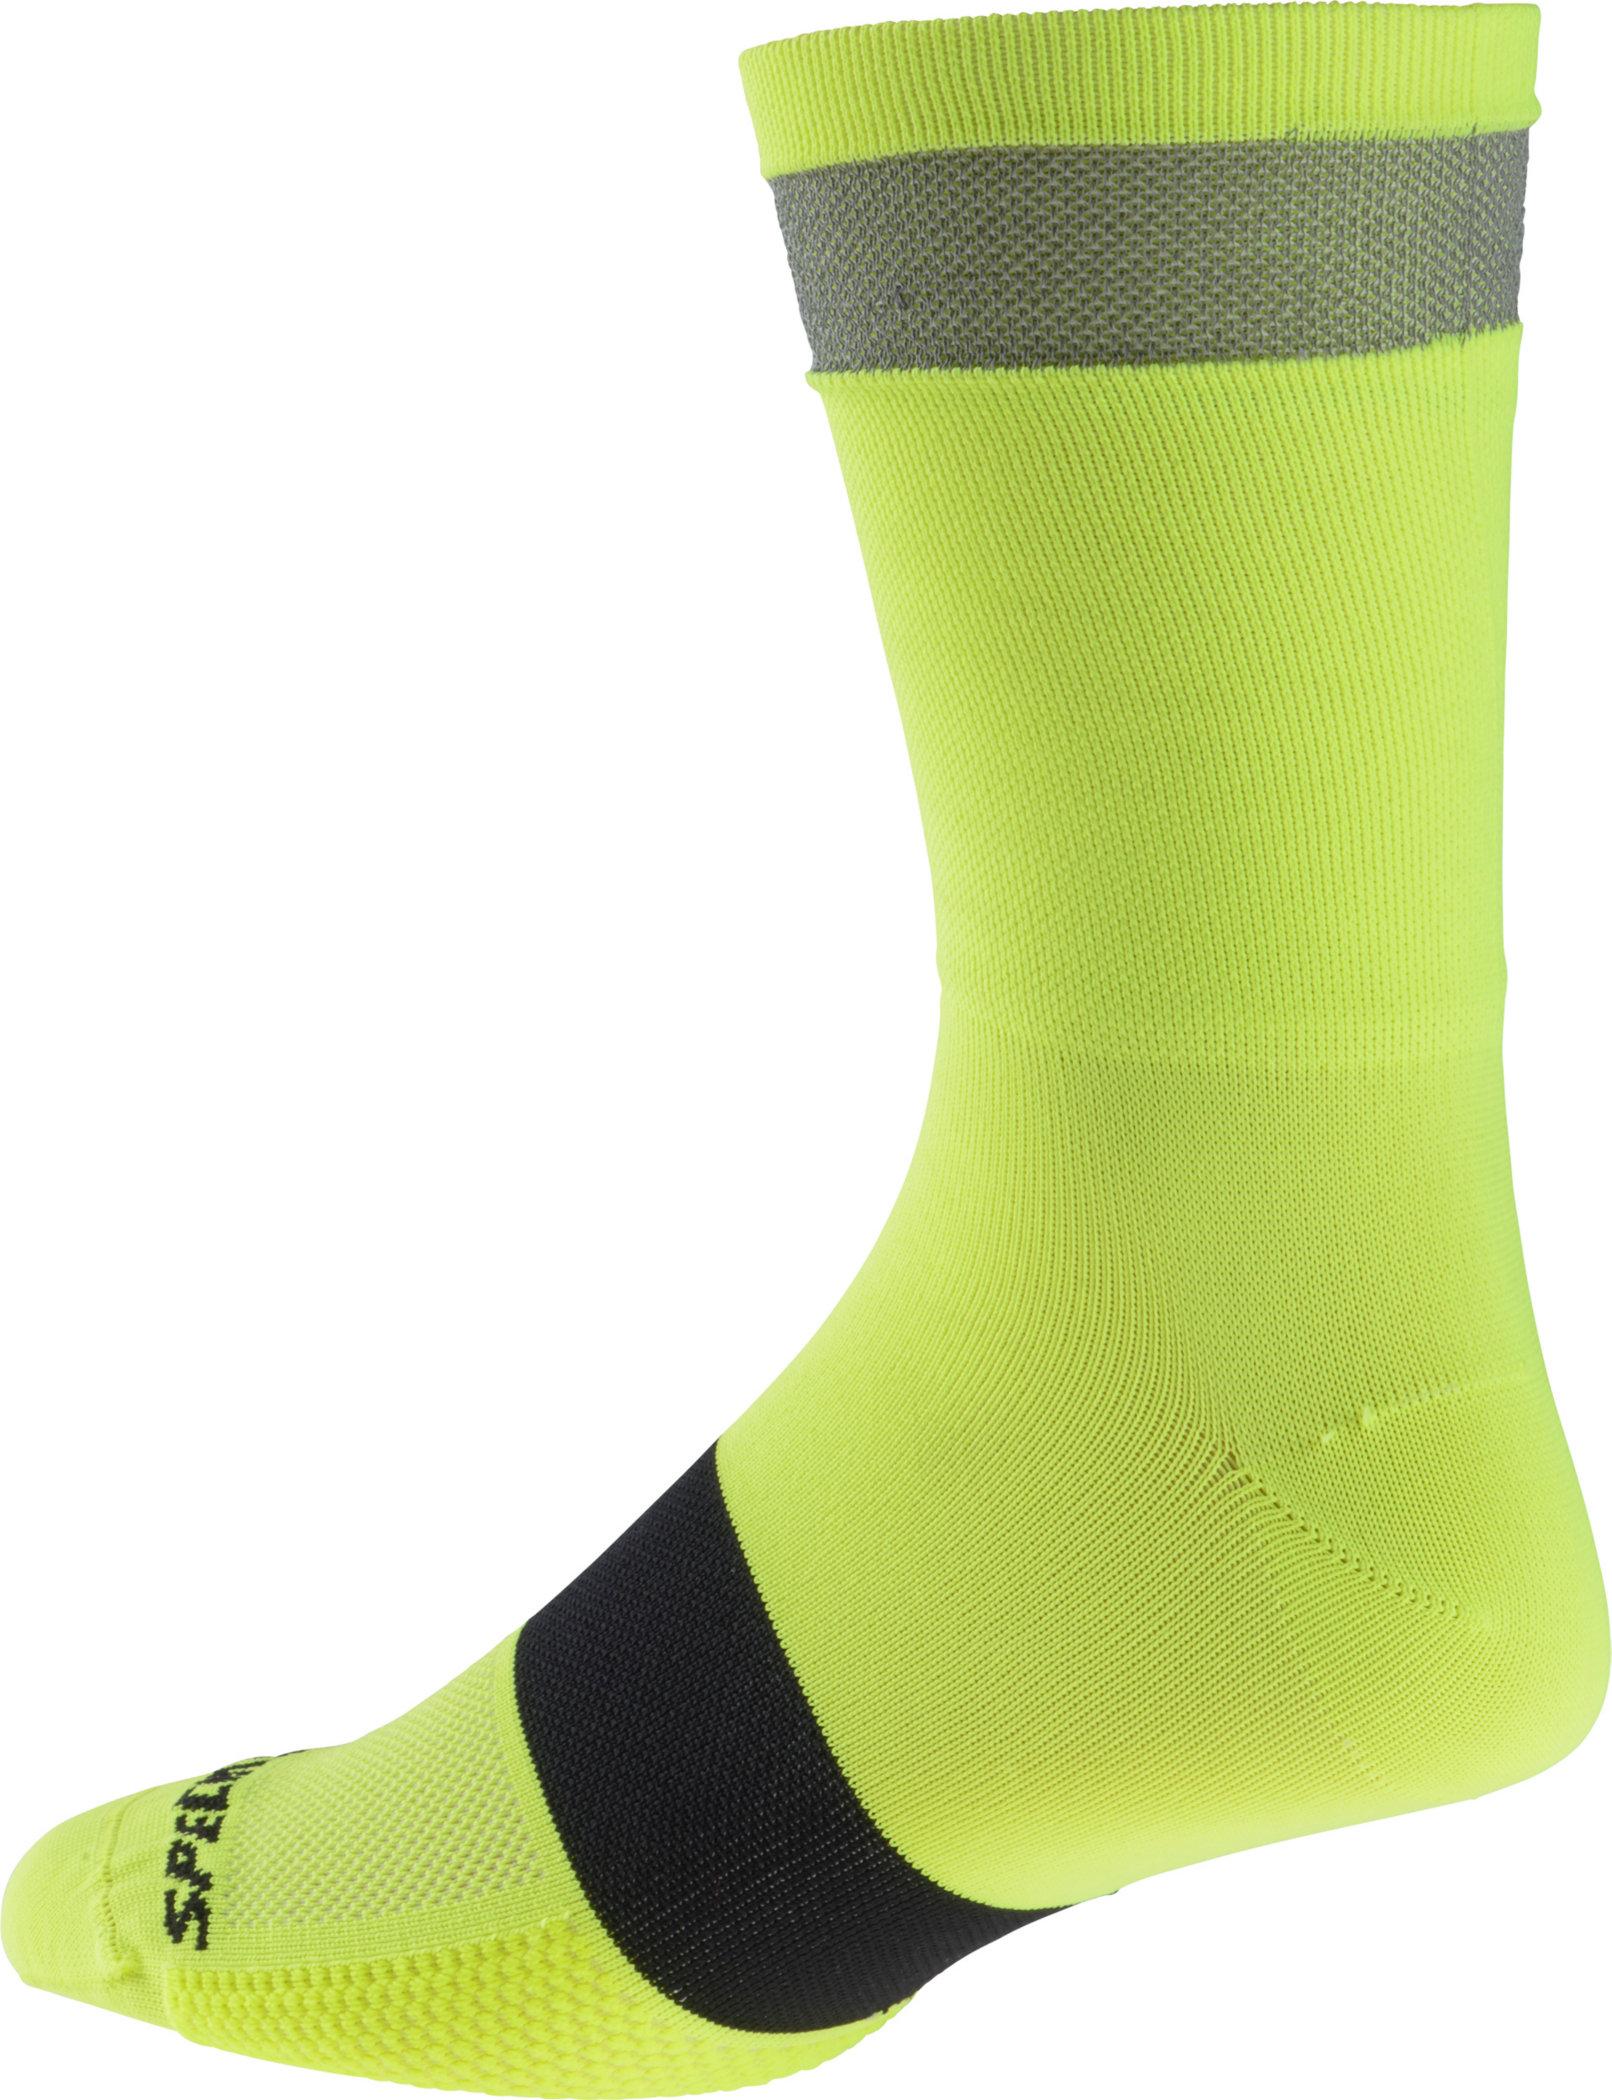 Specialized Women´s Reflect Tall Socks Neon Yellow Medium/Large - Alpha Bikes